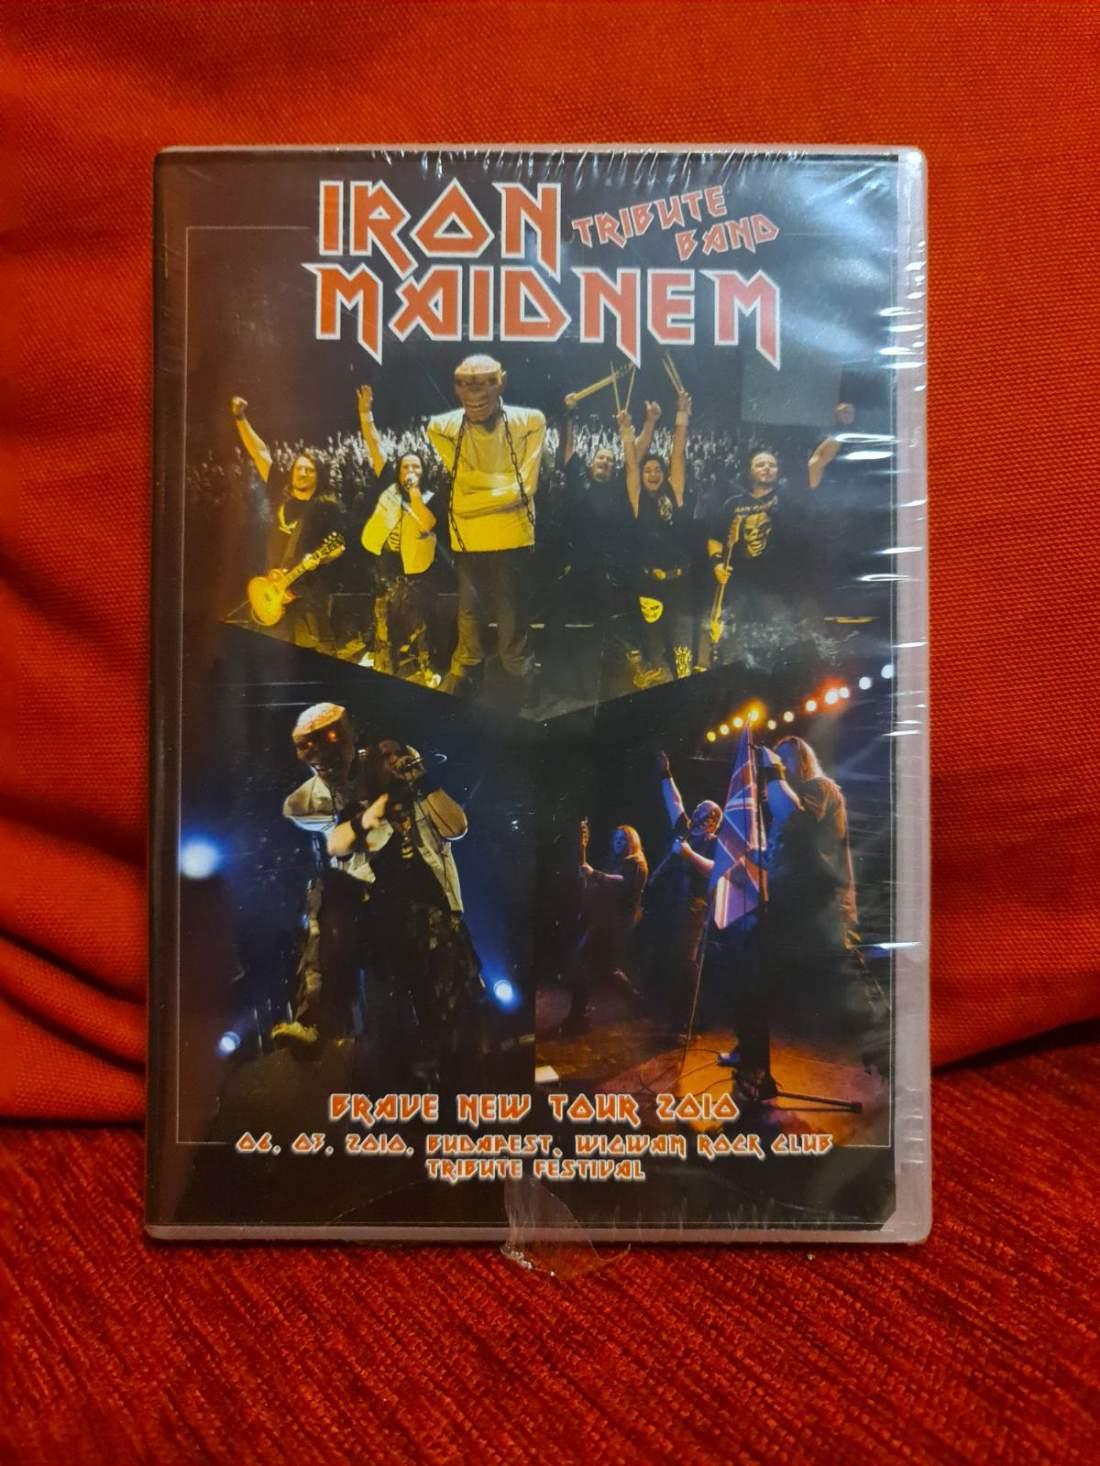 IRON MAIDNEM - BRAVE NEW TOUR 2010 DVD